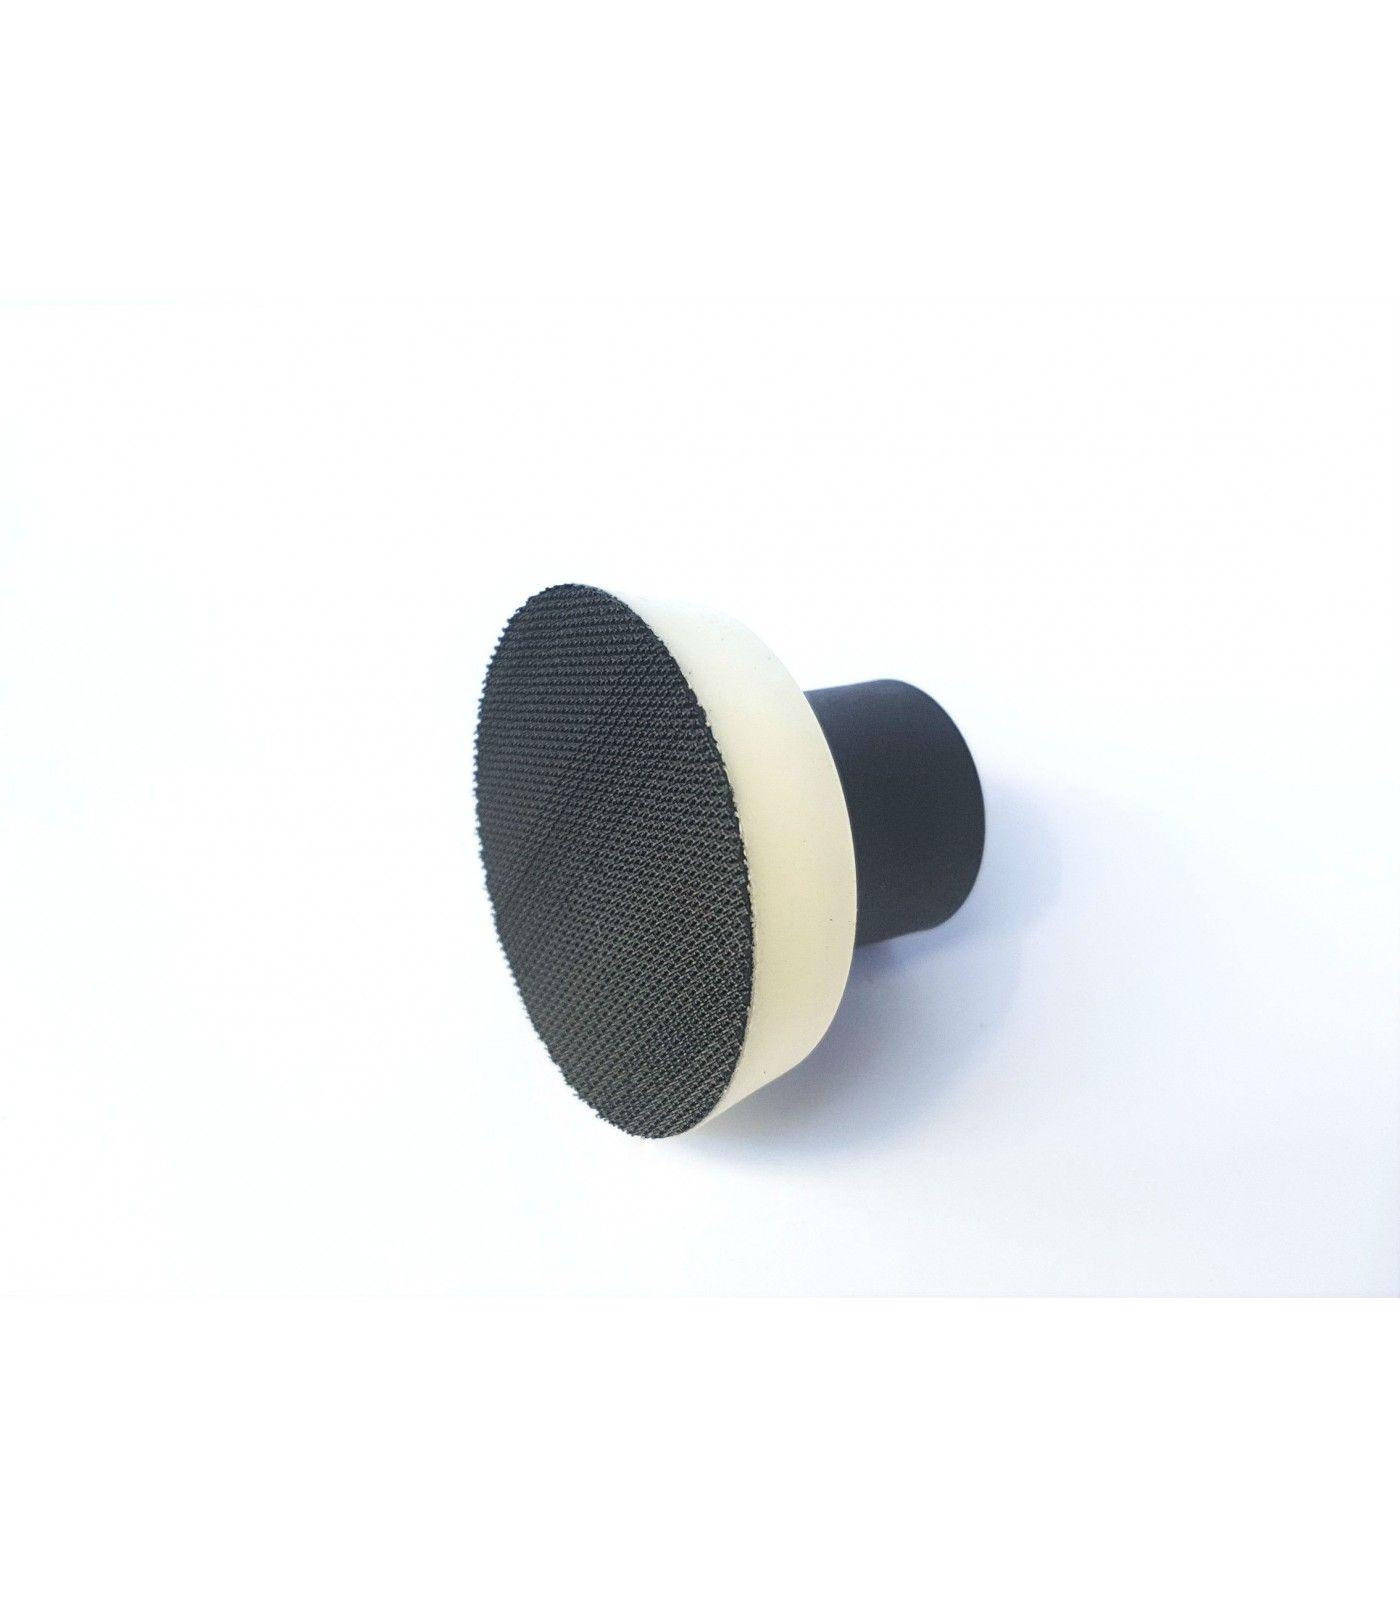 Taler - Rotary M14 - 2'' - 49mm Soft Density Backing  Plate